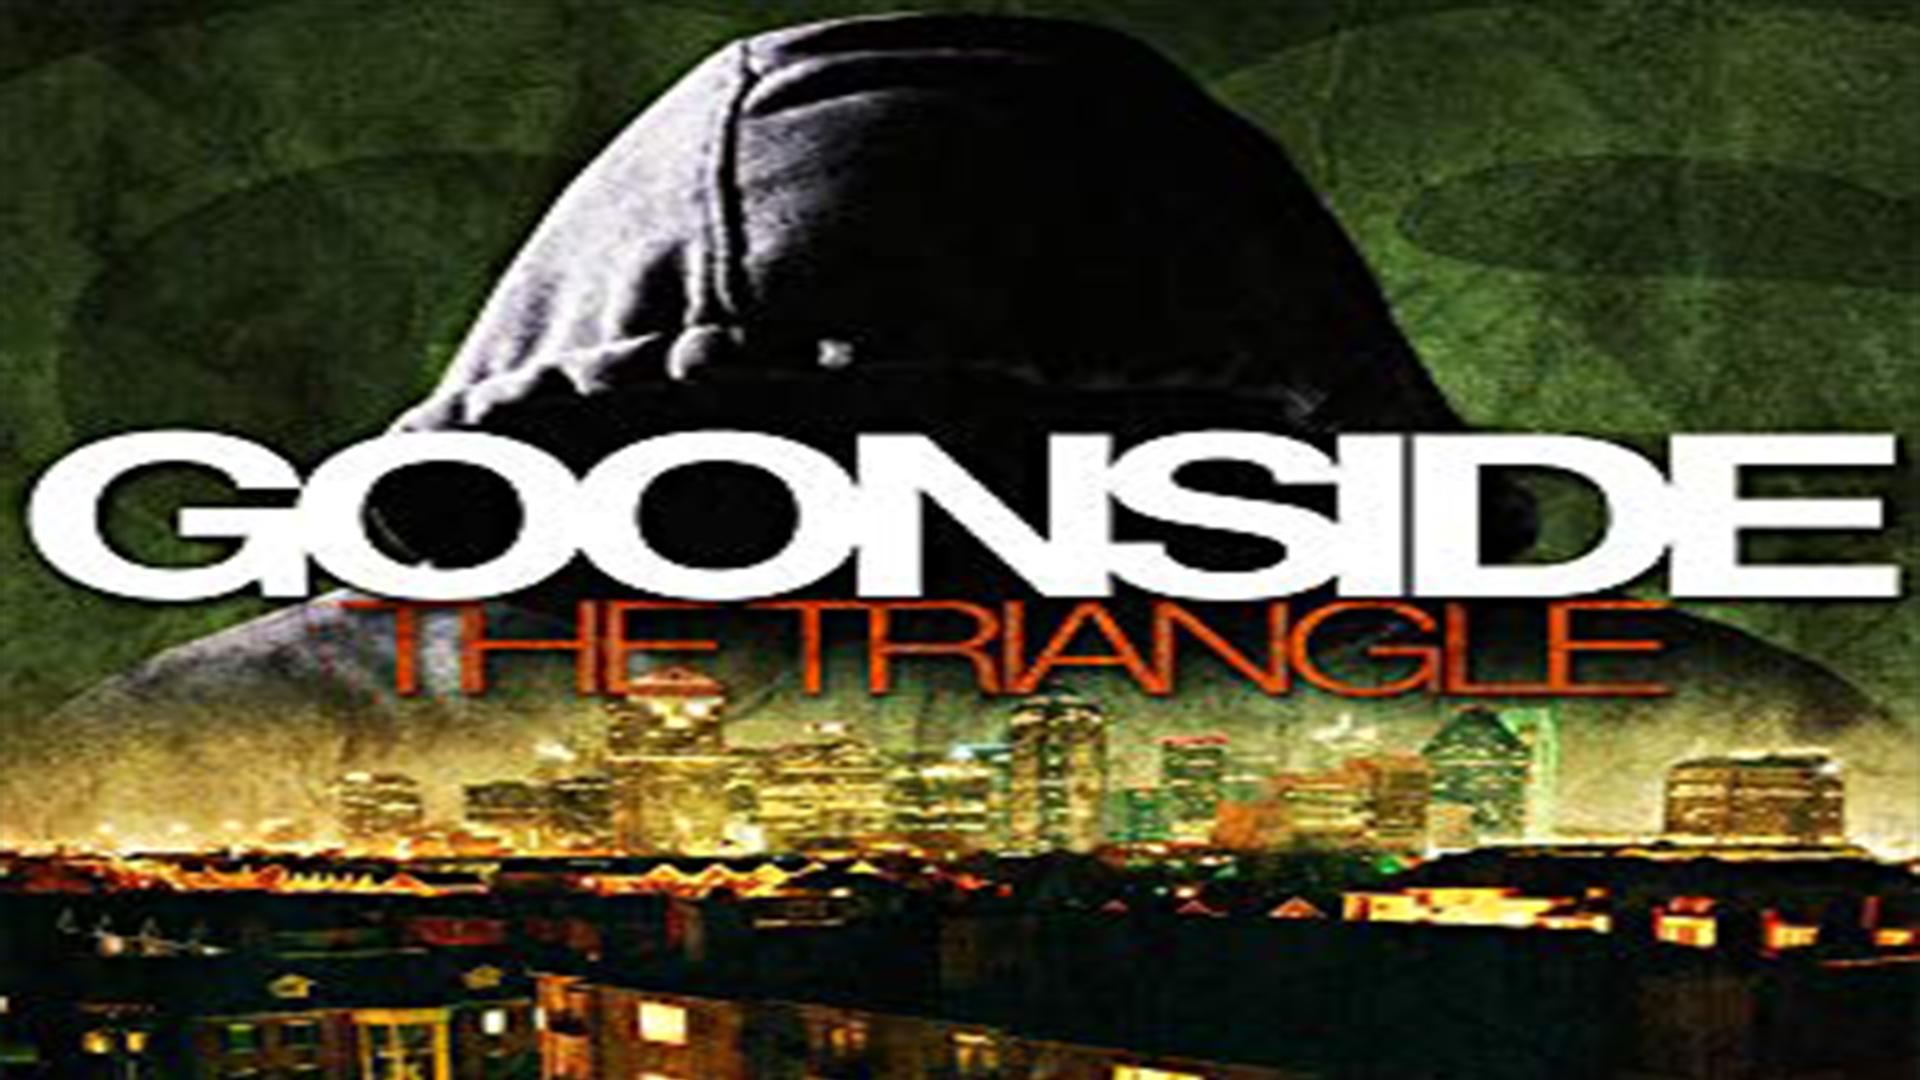 Goonside The Triangle